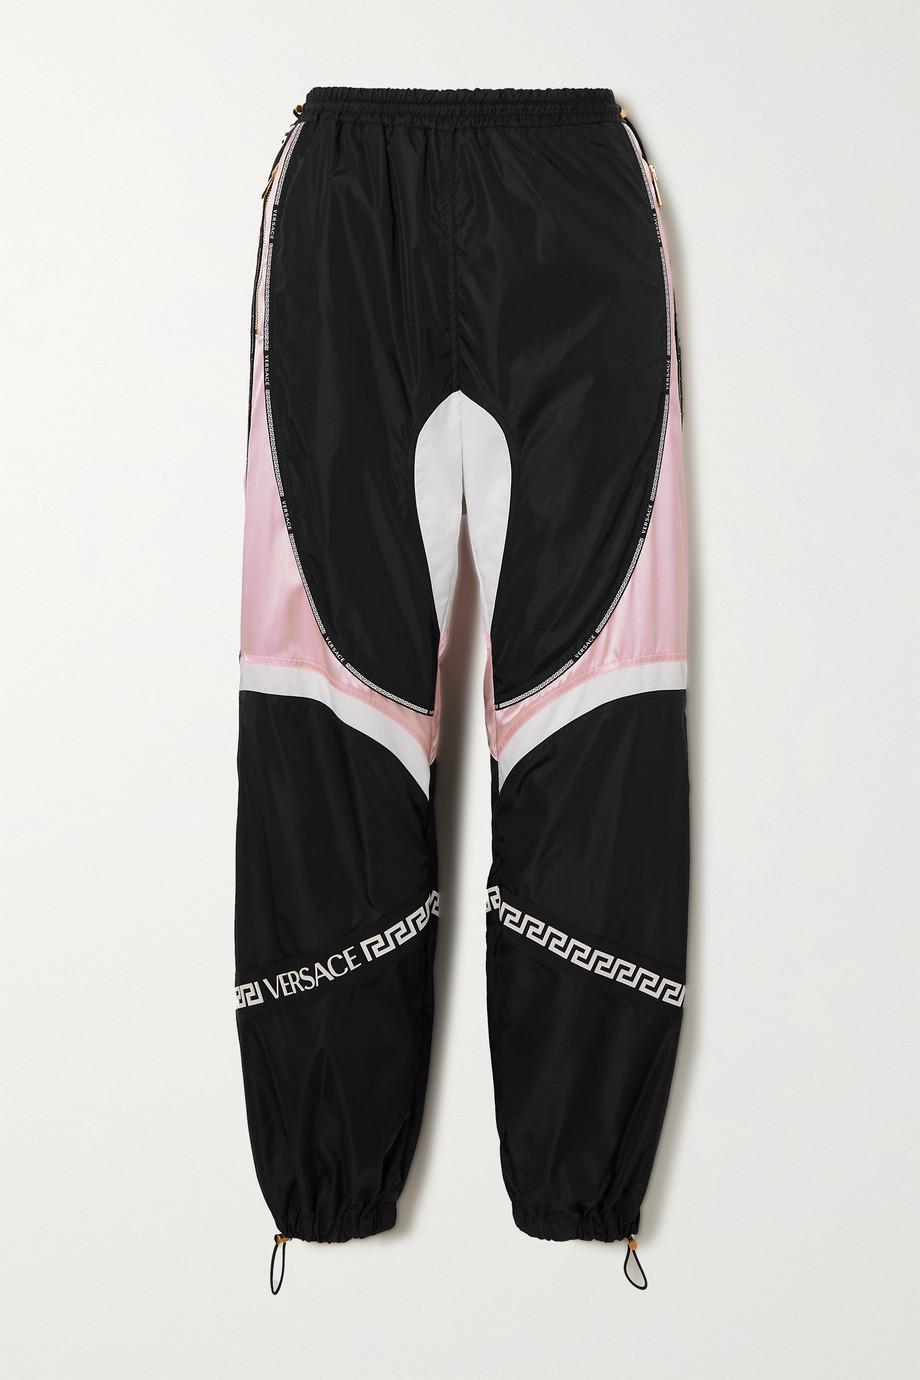 Versace Jogginghose aus Shell und Satin